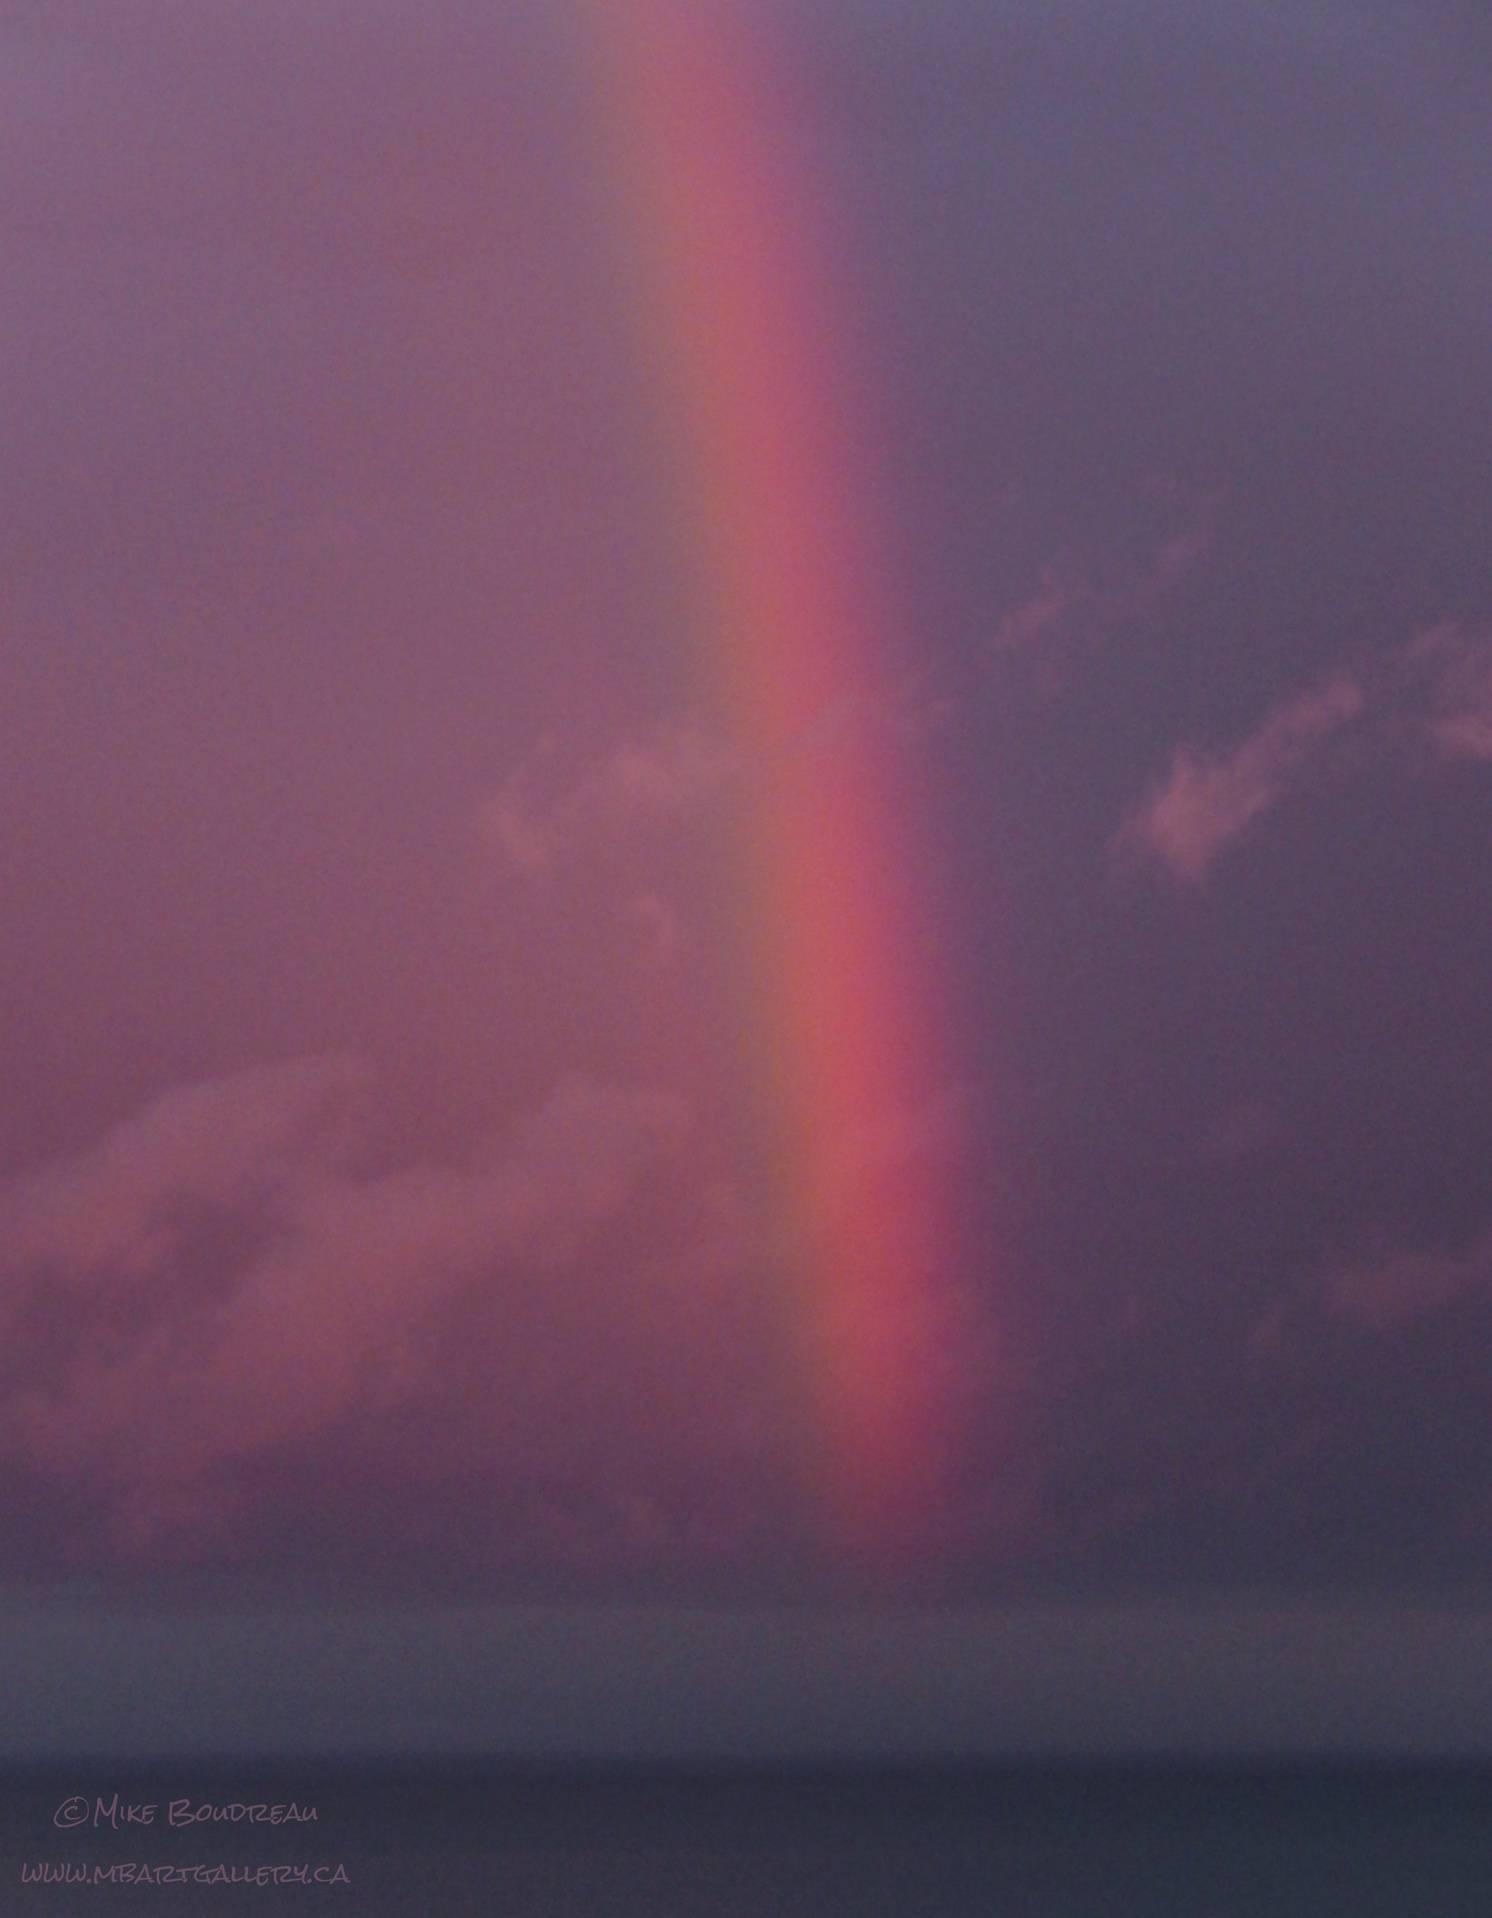 Bay of Fundy Rainbow, Saint John NB